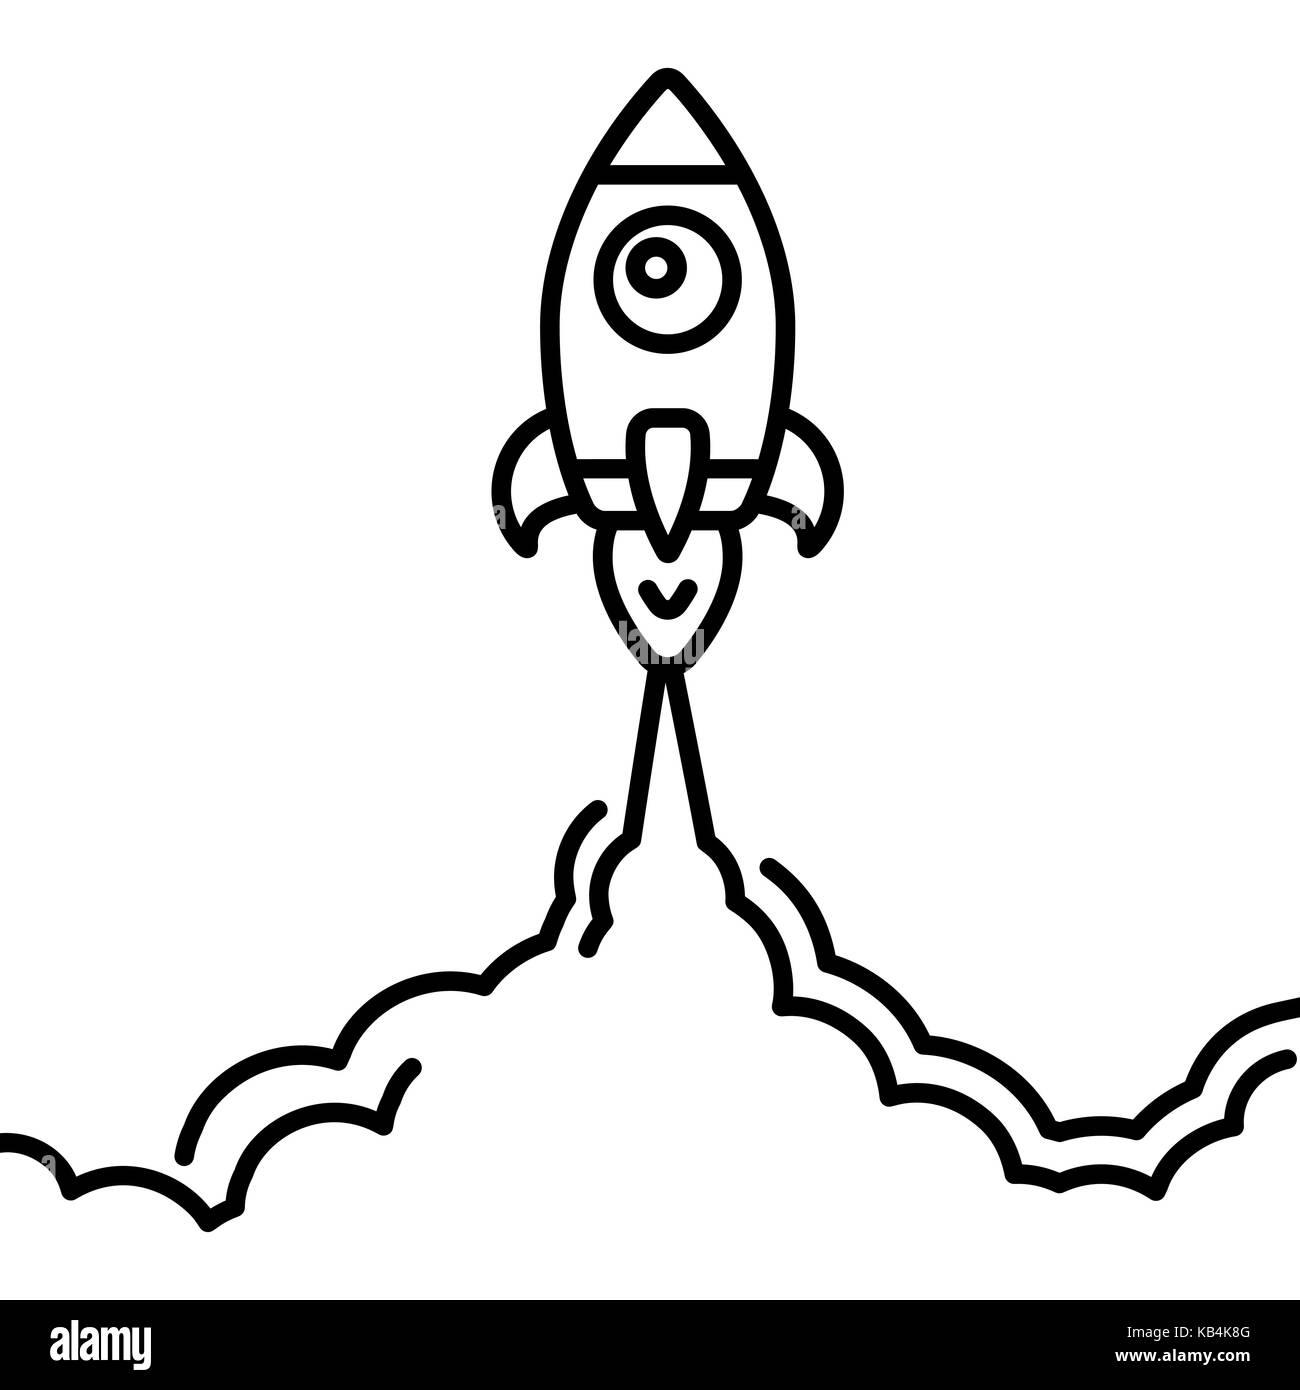 space rocket ship wallpaper background stock photos u0026 space rocket